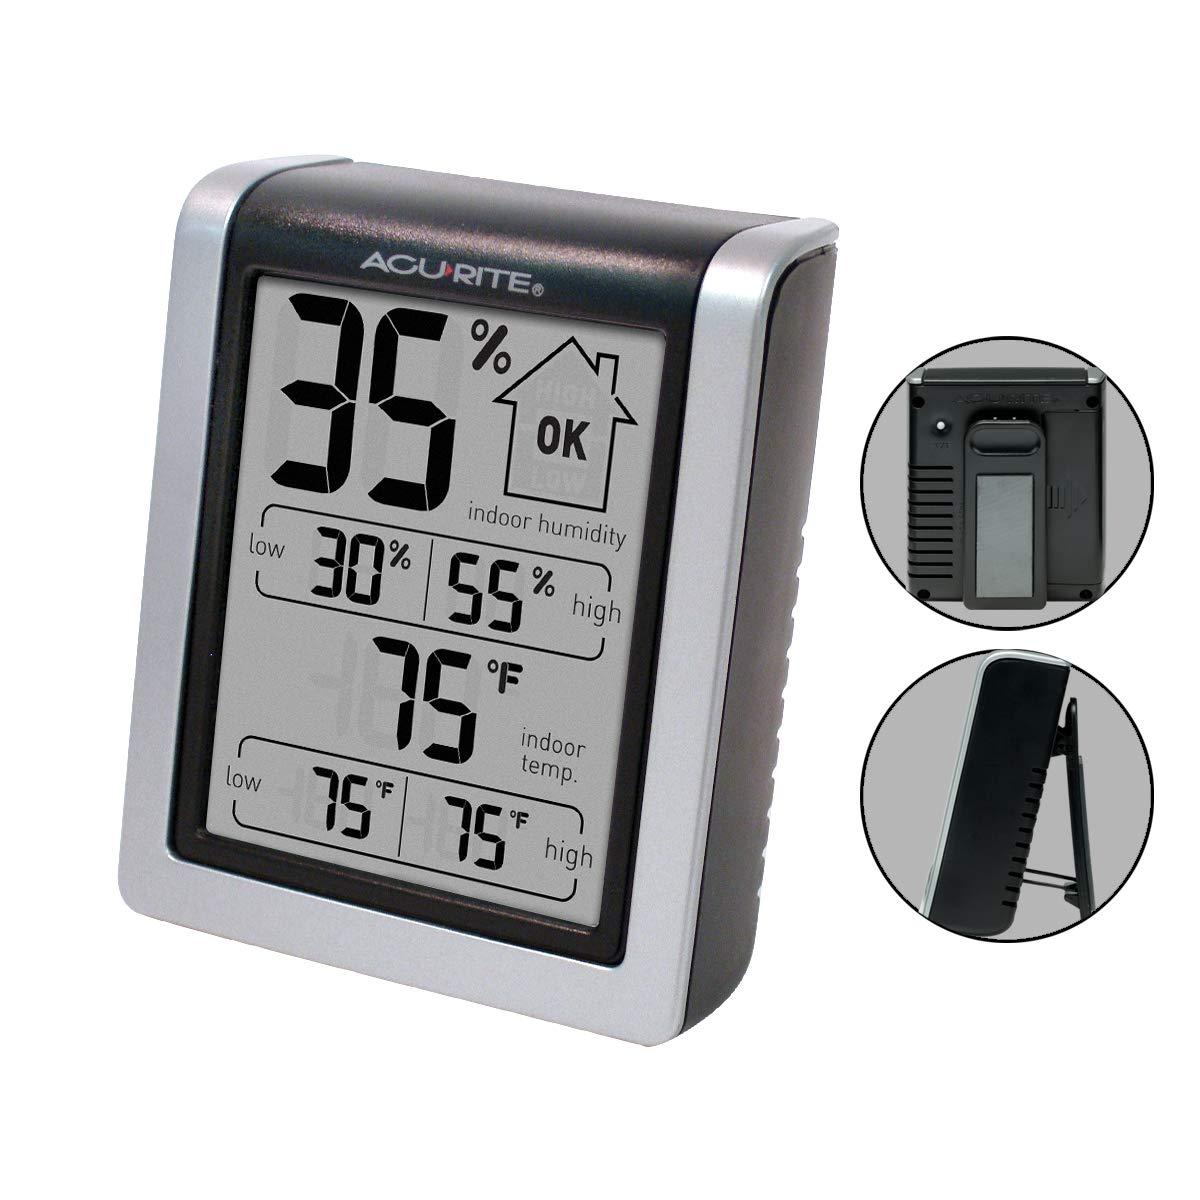 AcuRite Humidity Thermometer Hygrometer Indicator